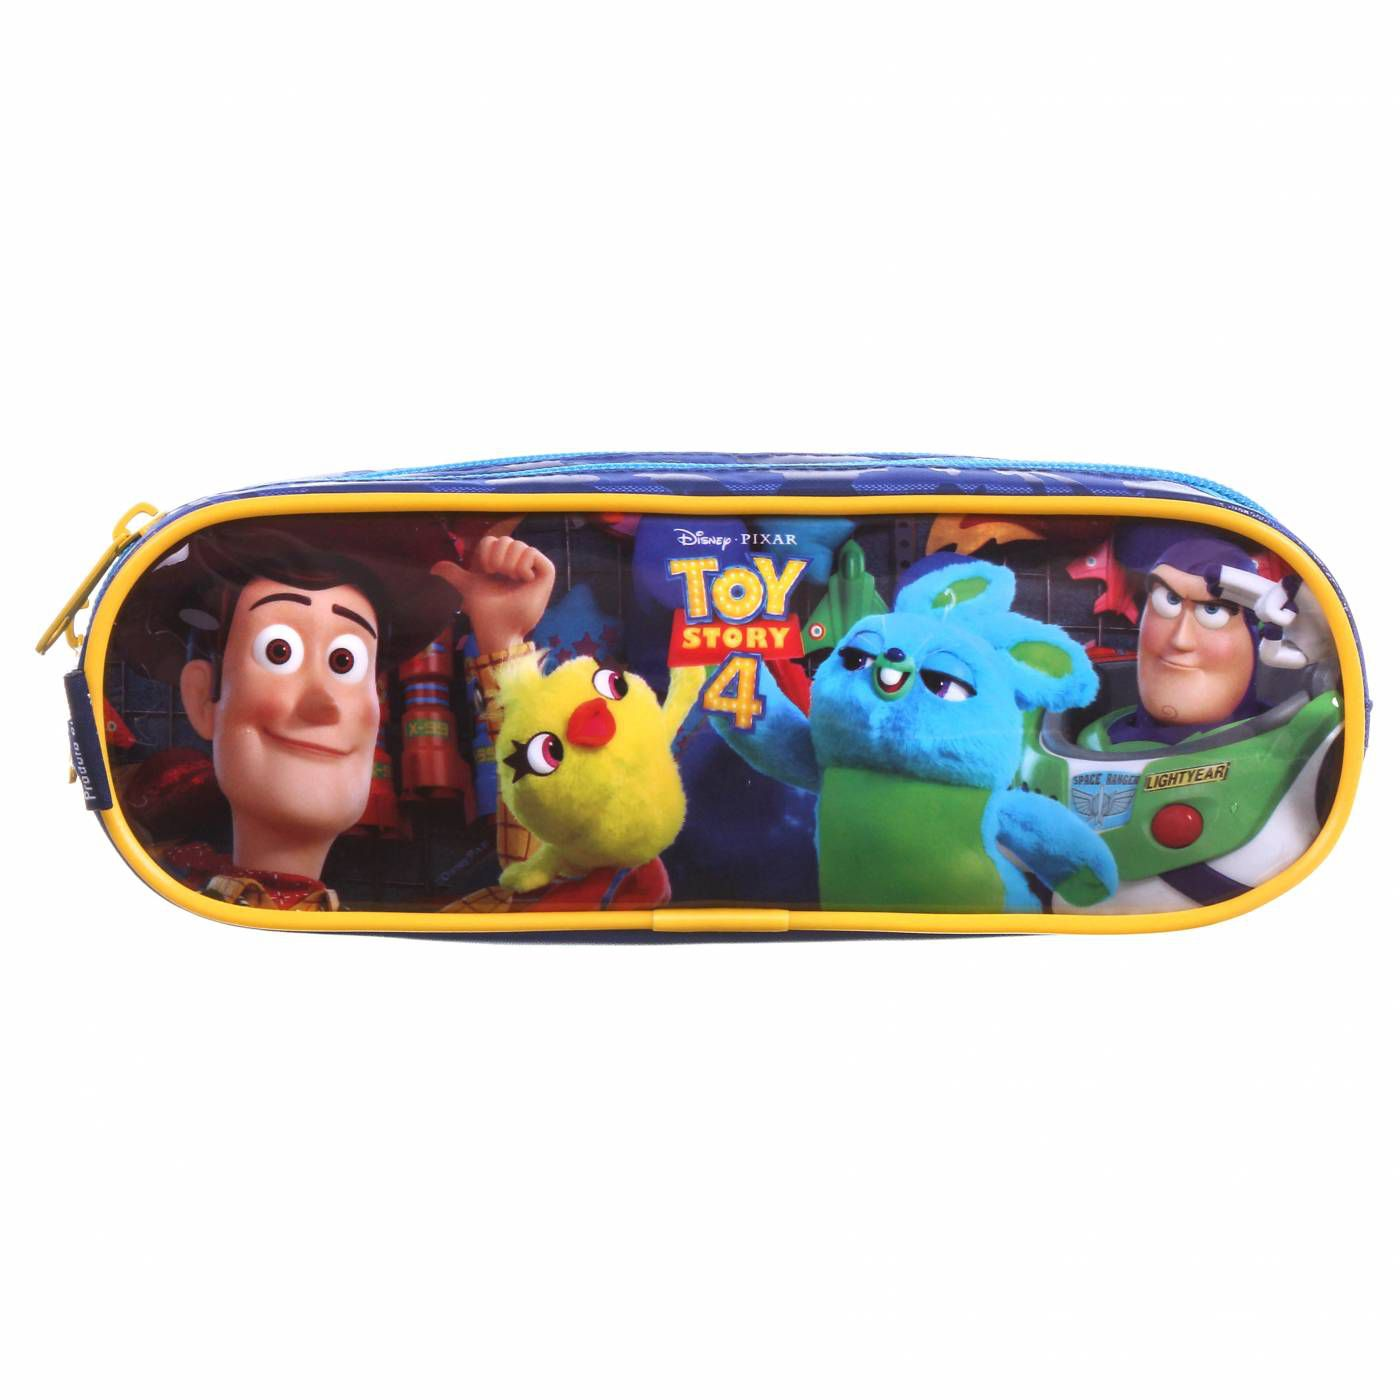 Estojo Duplo Dermiwil Toy Story 4 Ref. 37542